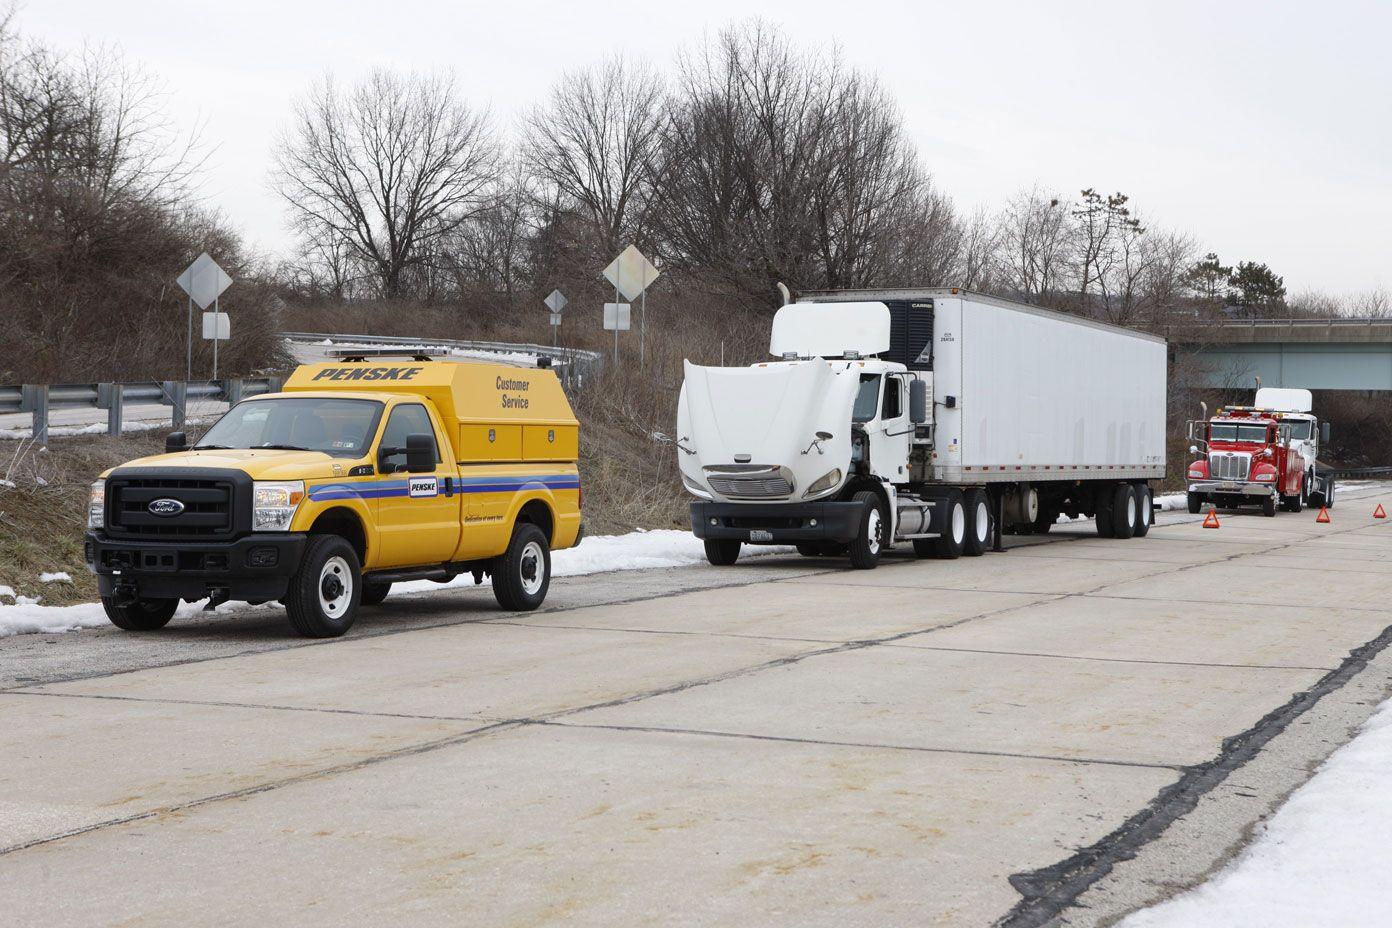 Penske's 24/7 Roadside Assistance Team is Always On Call